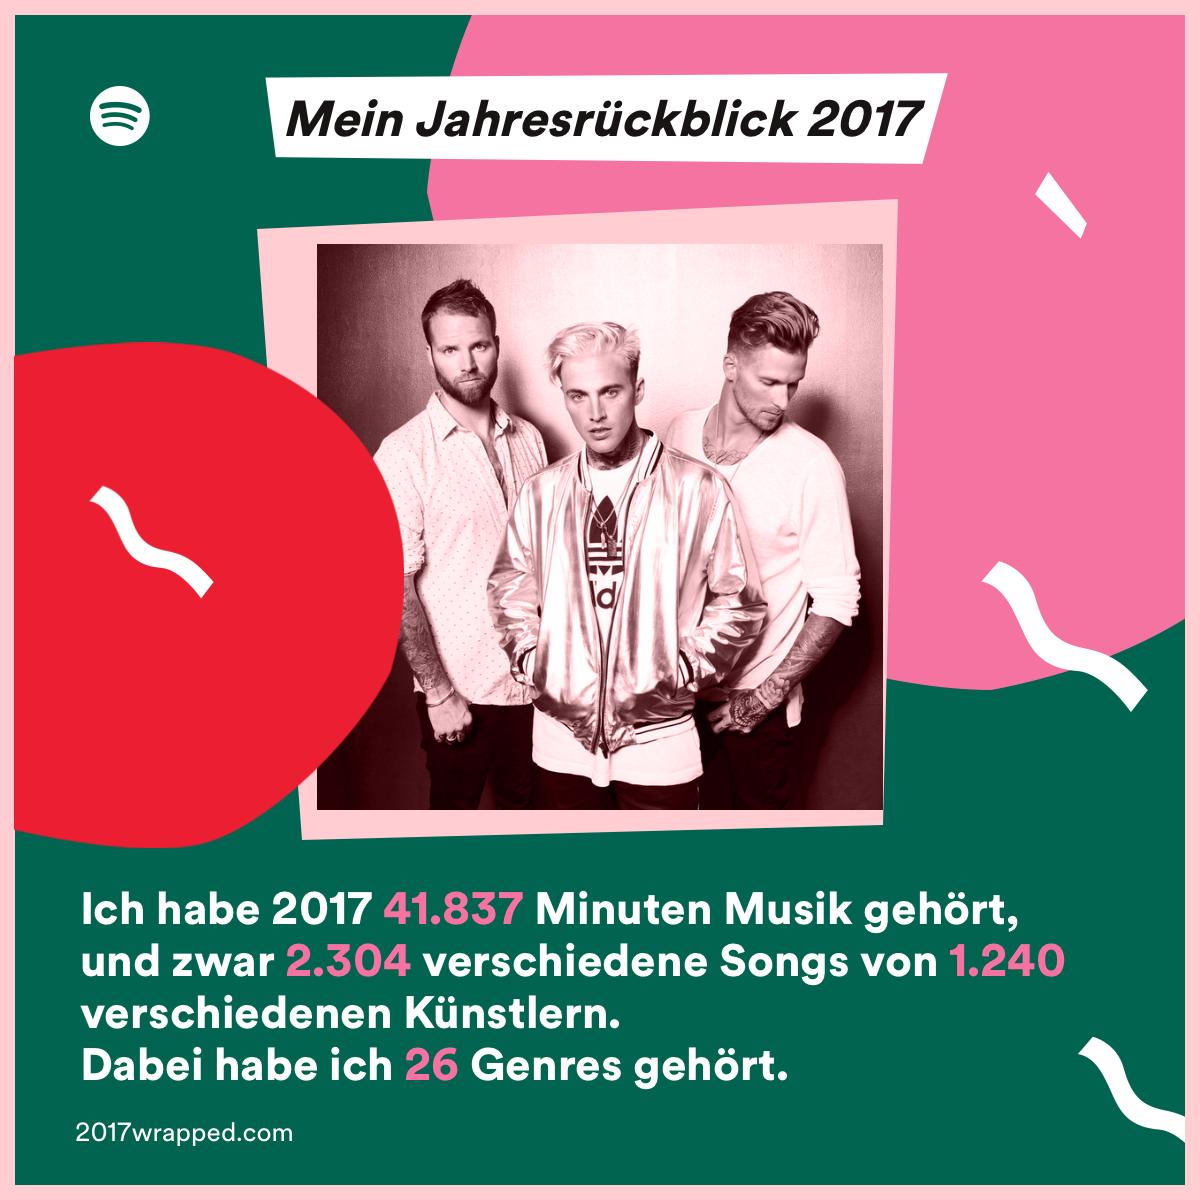 spotify jahresrückblick musik peachymoments 2017 übersicht